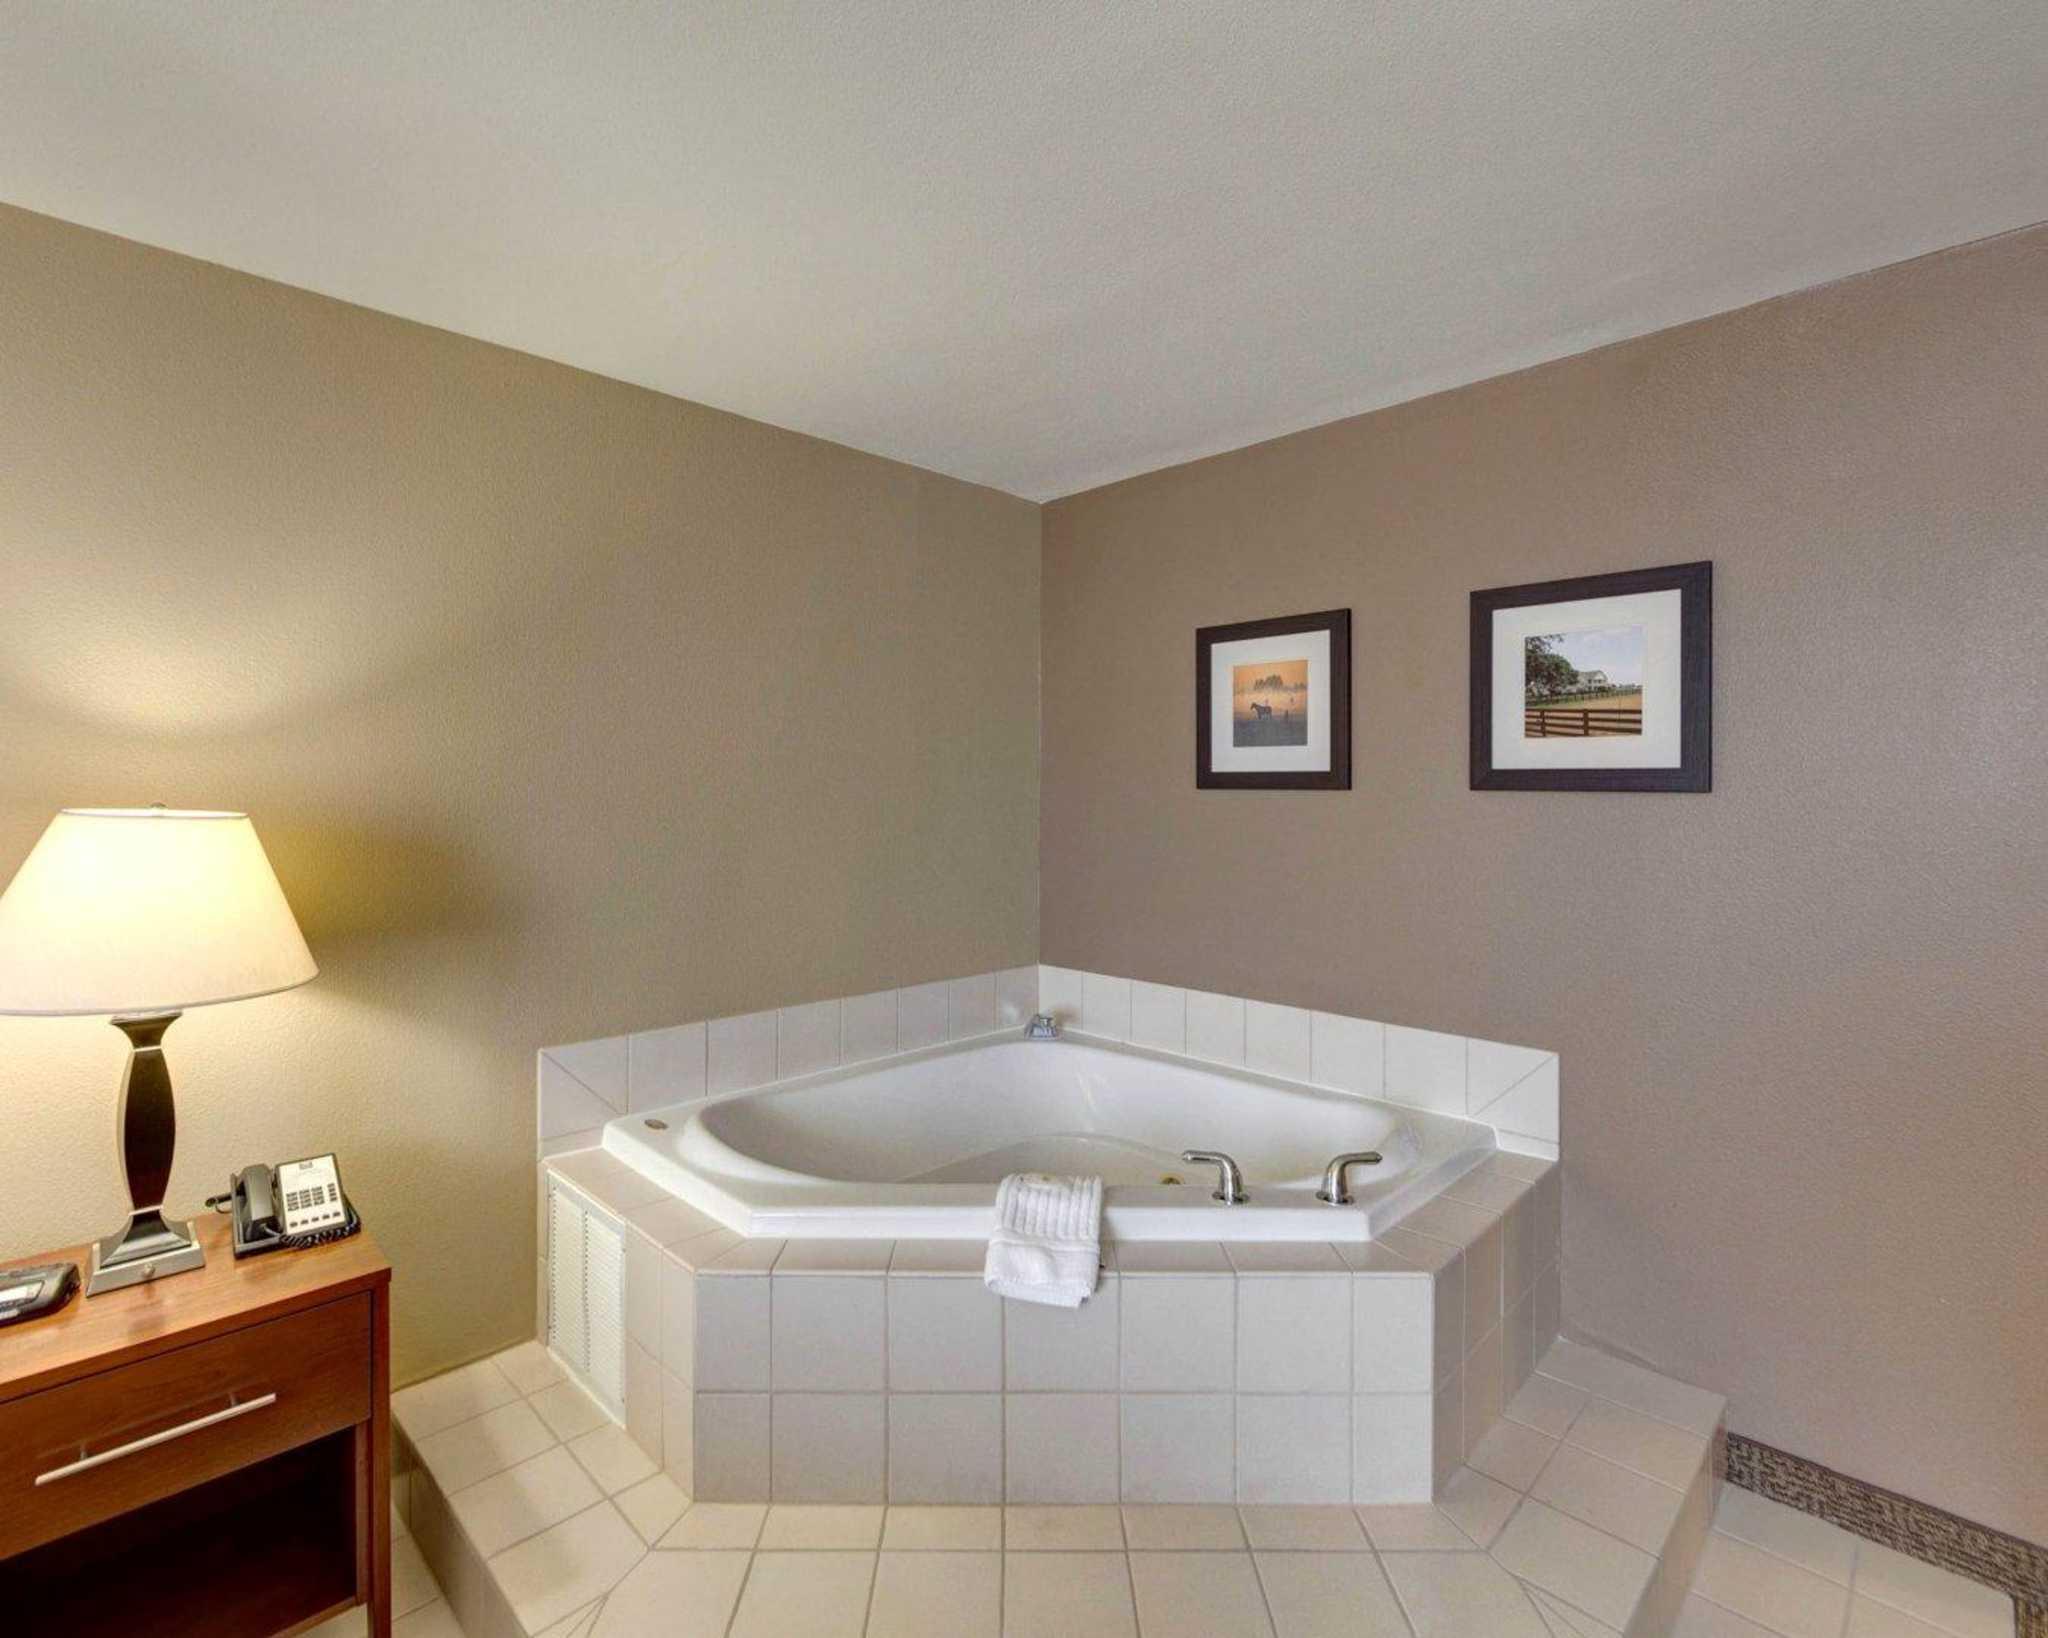 Comfort Inn & Suites Plano East image 42